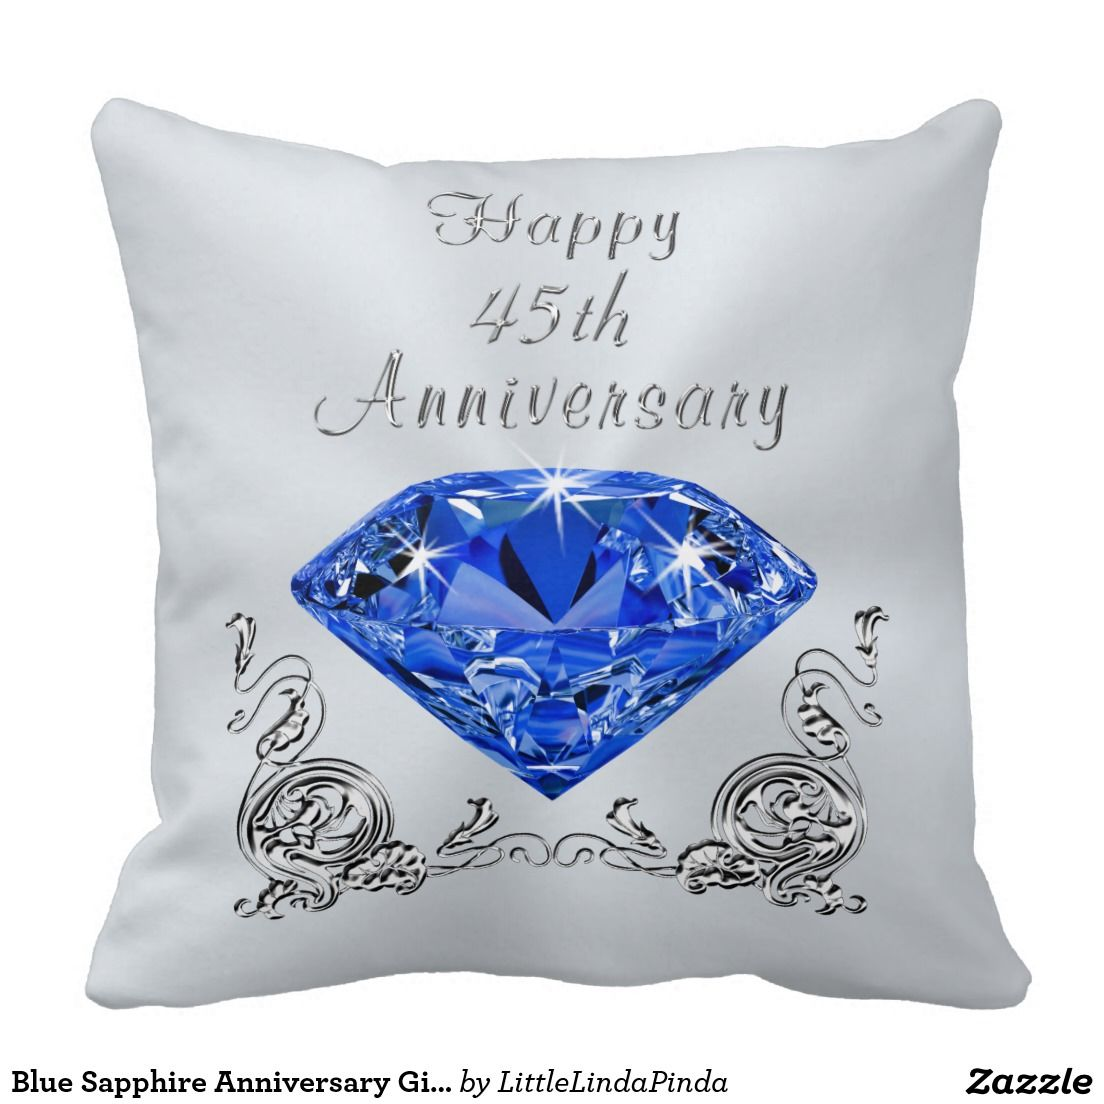 Blue Sapphire Anniversary Gifts, 45th Anniversary Throw